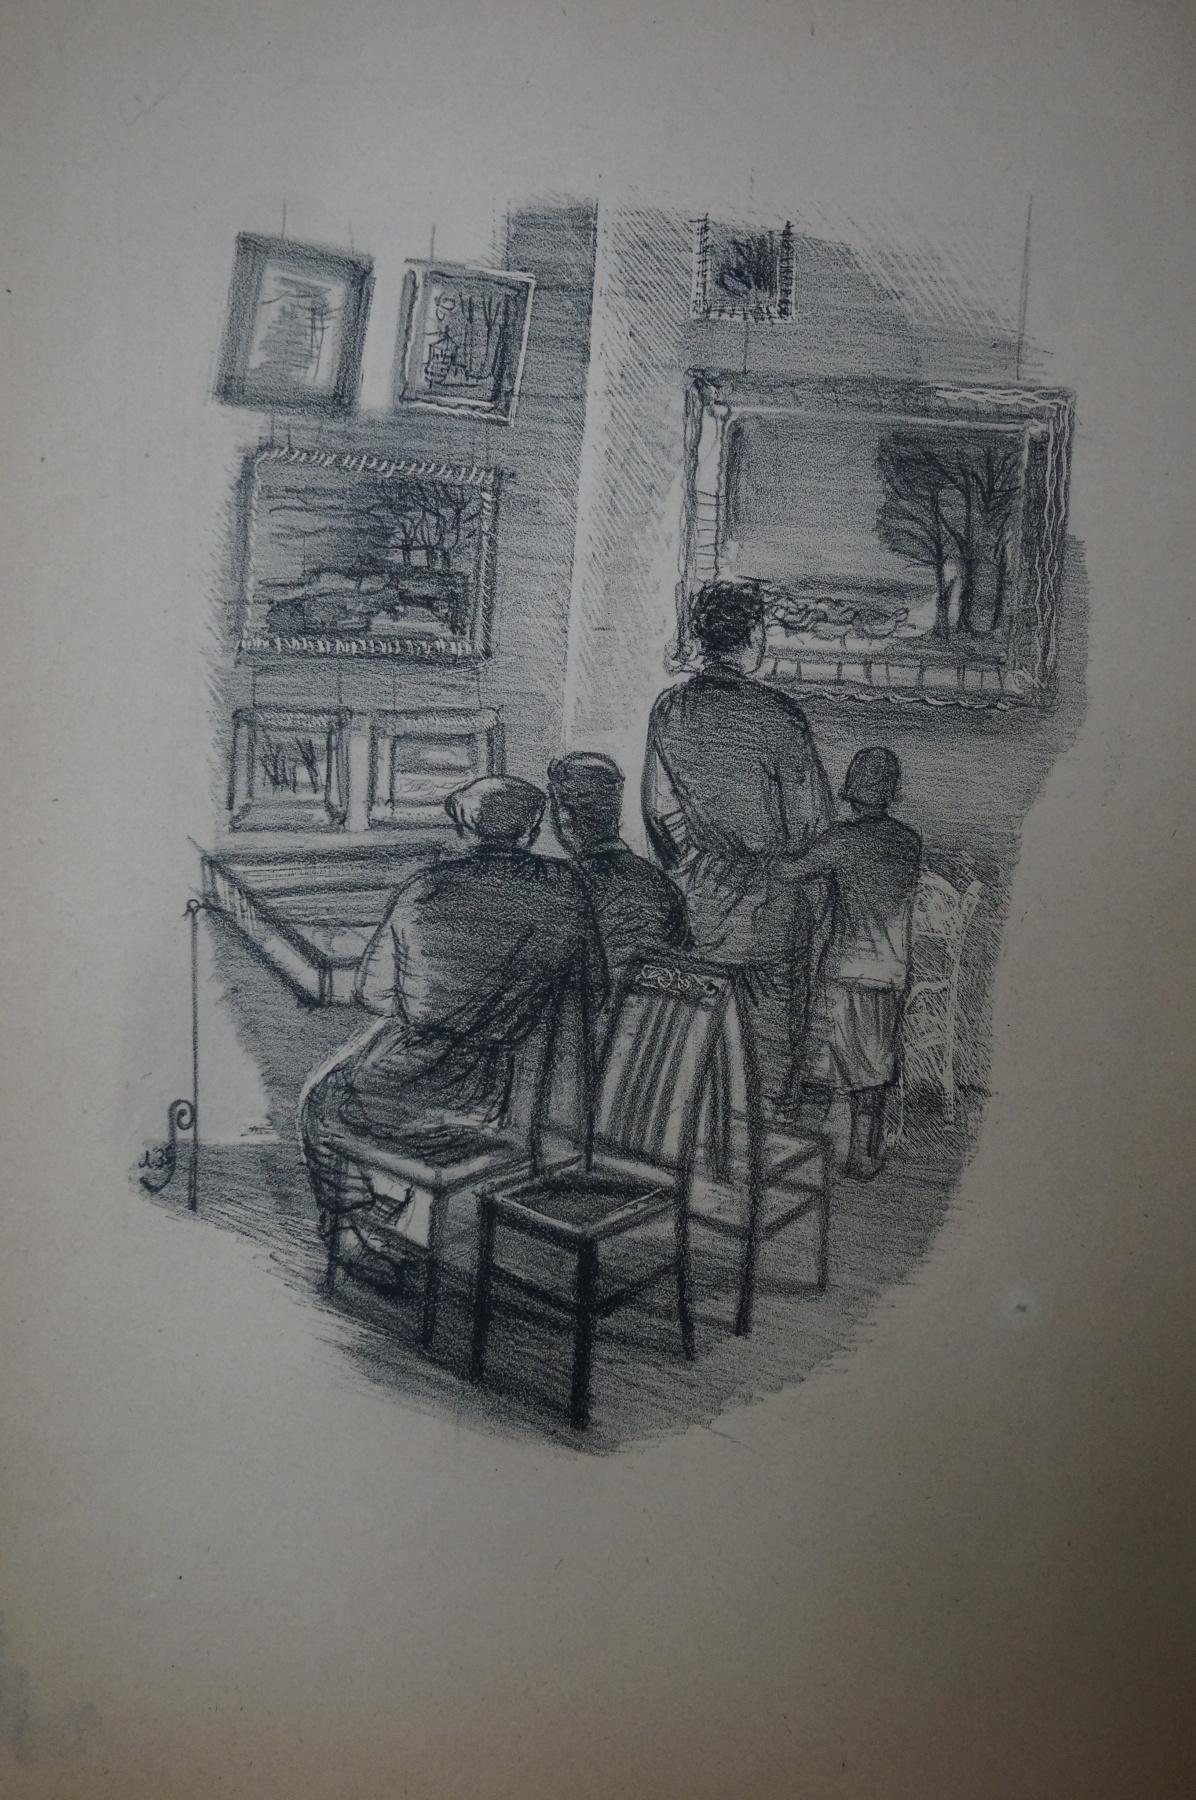 Petr Vasilyevich Luzgin. Museum inspection